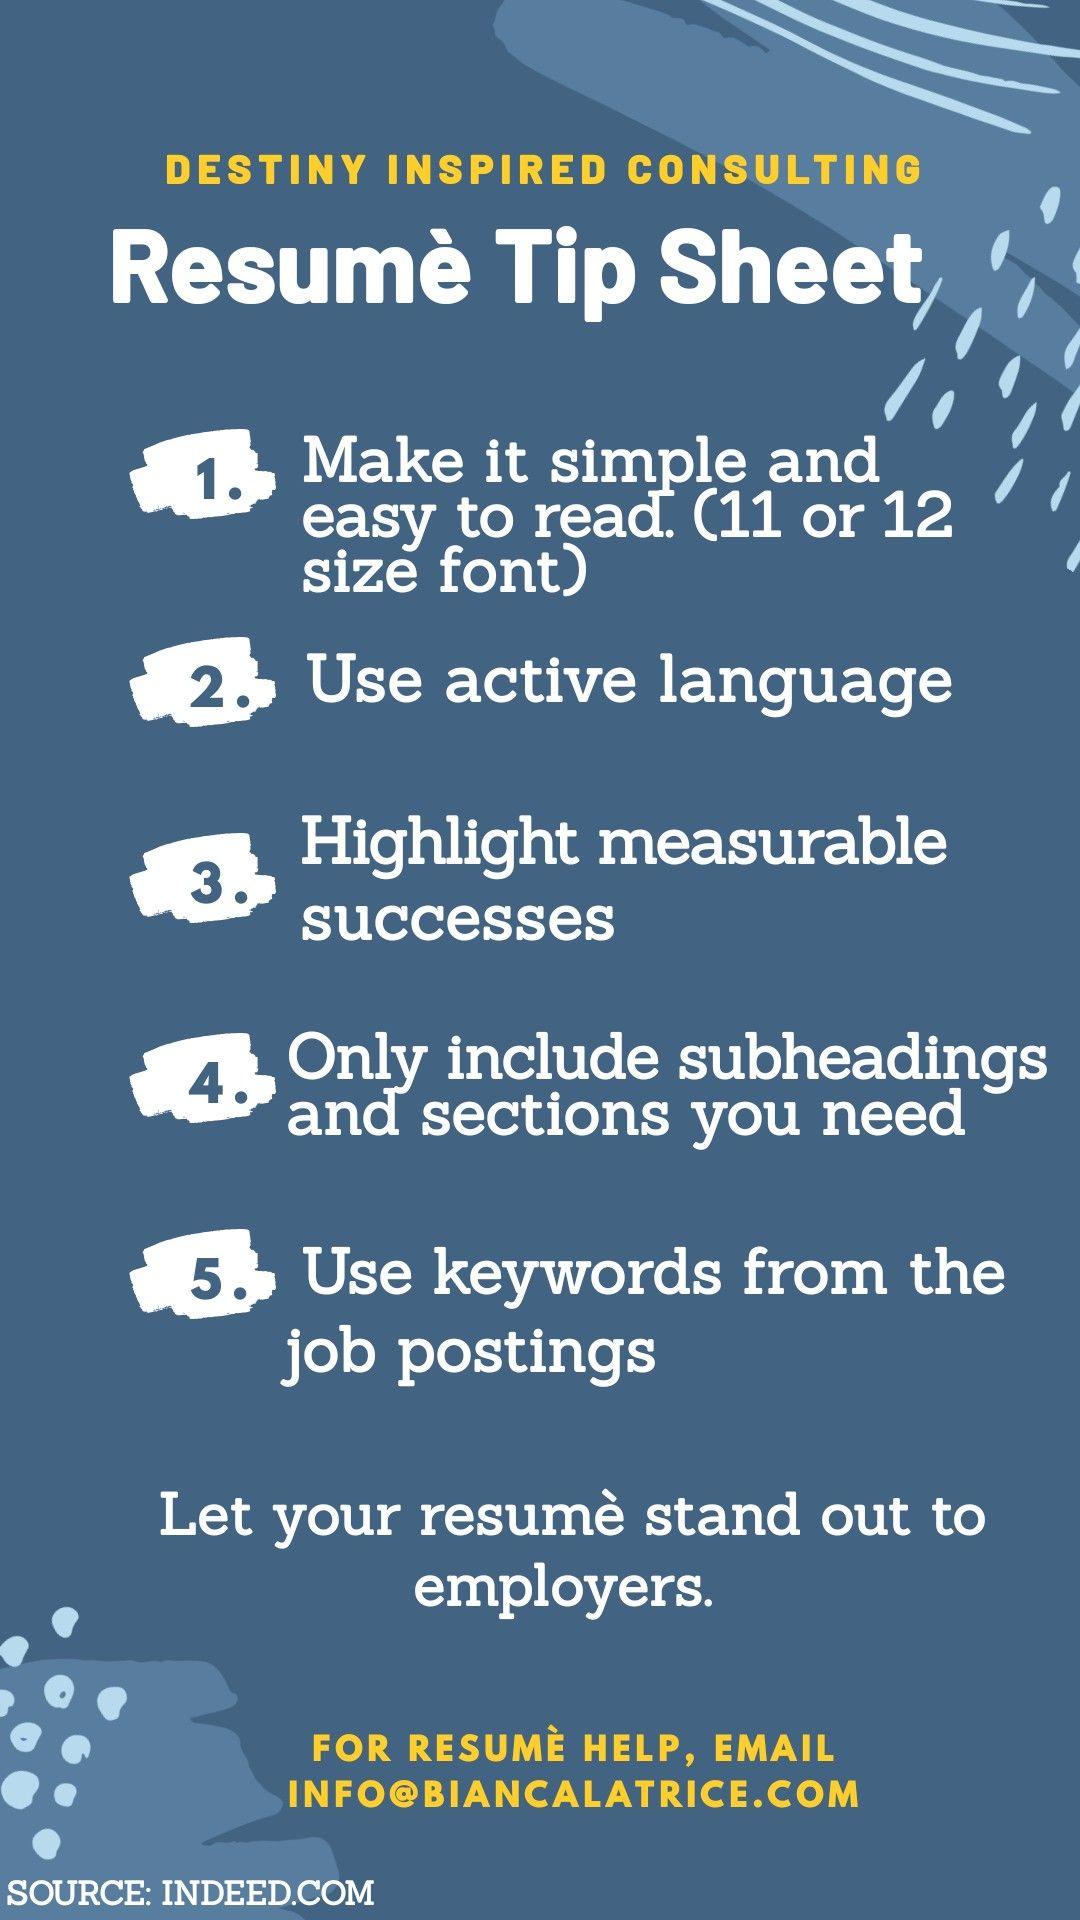 Resume tip sheet infographic font size job description